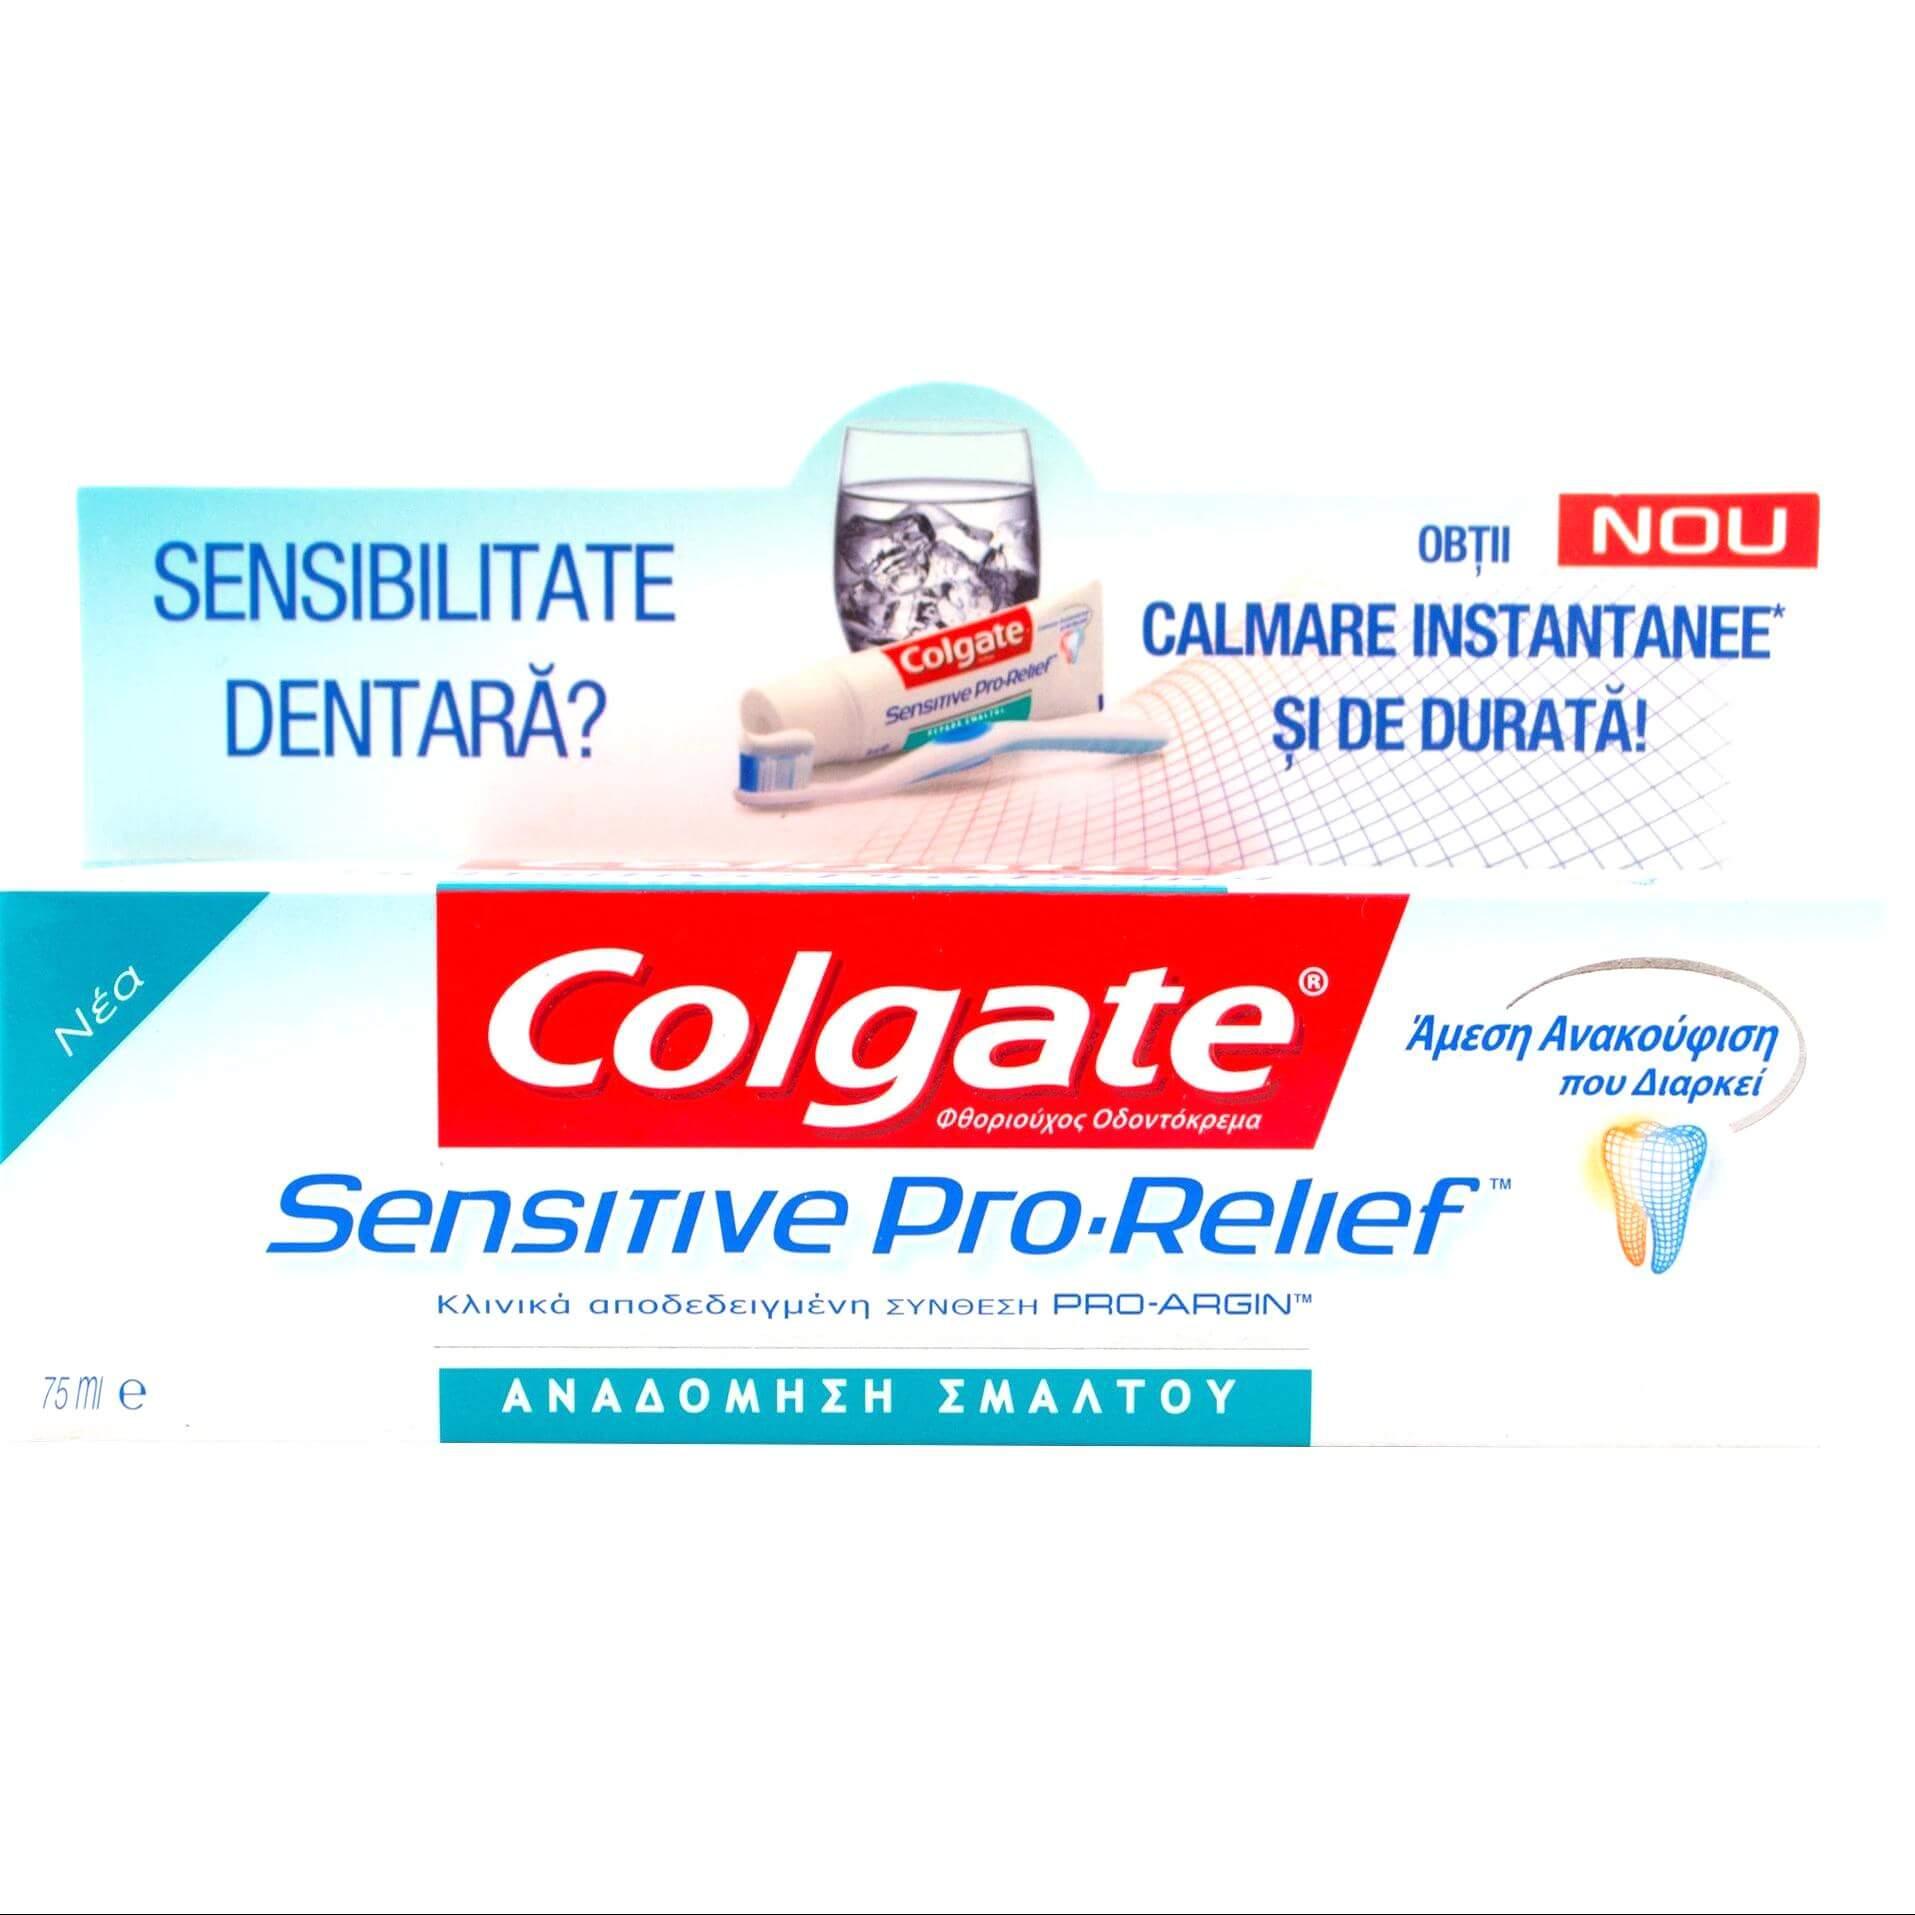 Colgate® Sensitive Pro-Relief™ Οδοντόκρεμα Άμεση & Μεγάλης Διάρκειας Ανακούφιση Από την Οδοντινική Υπερευαισθησία 75ml